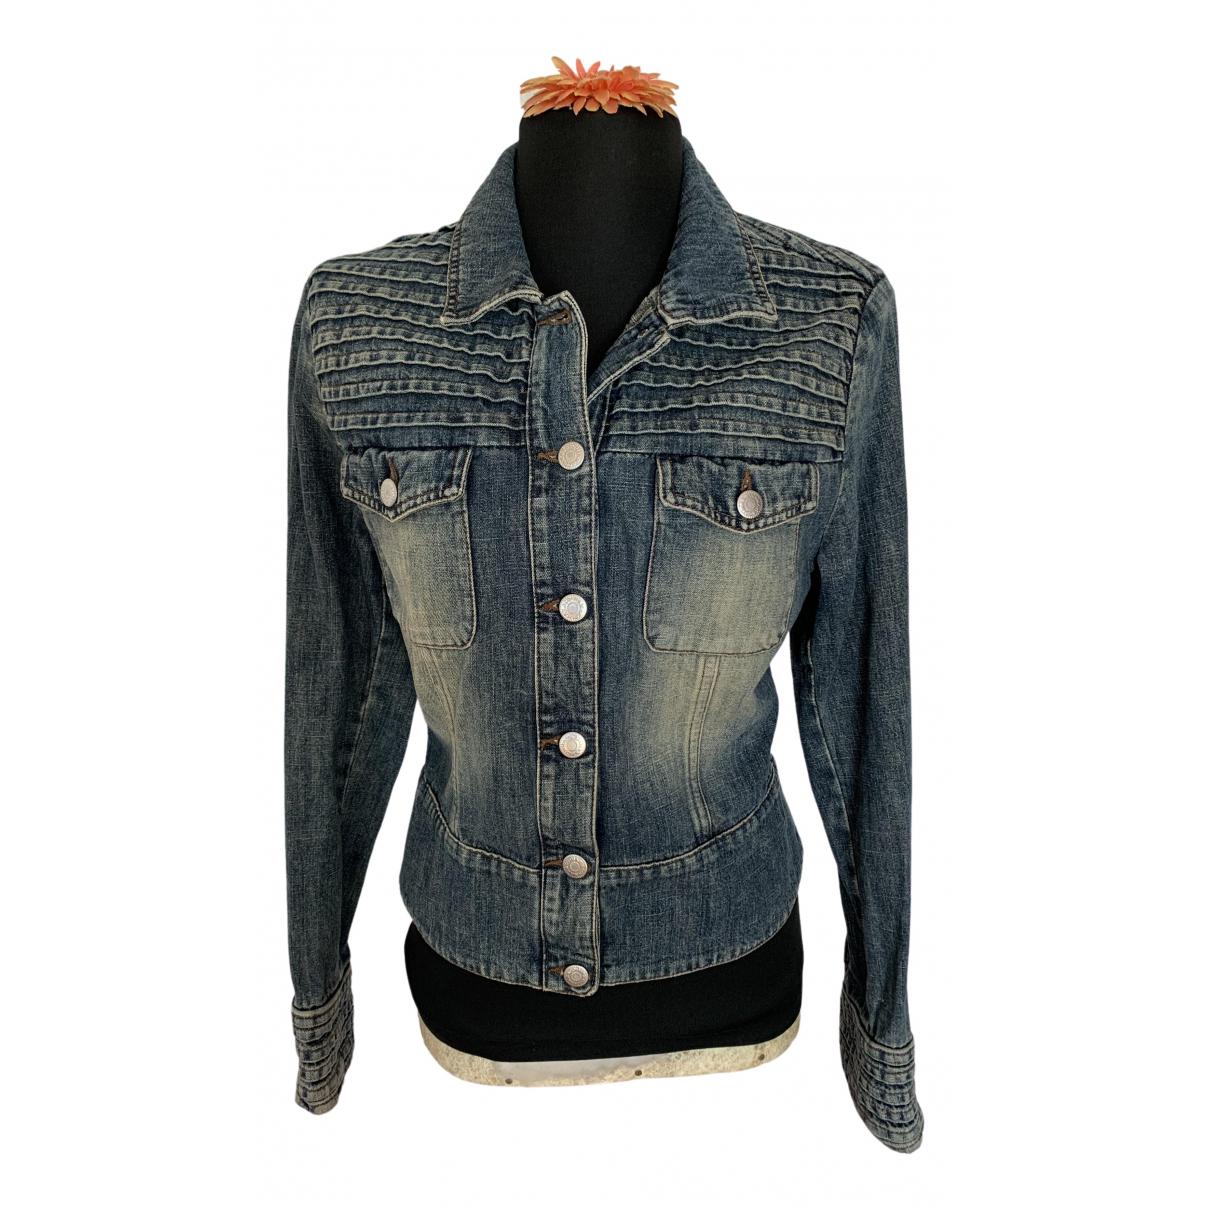 Max & Co \N Blue Denim - Jeans jacket for Women 44 IT